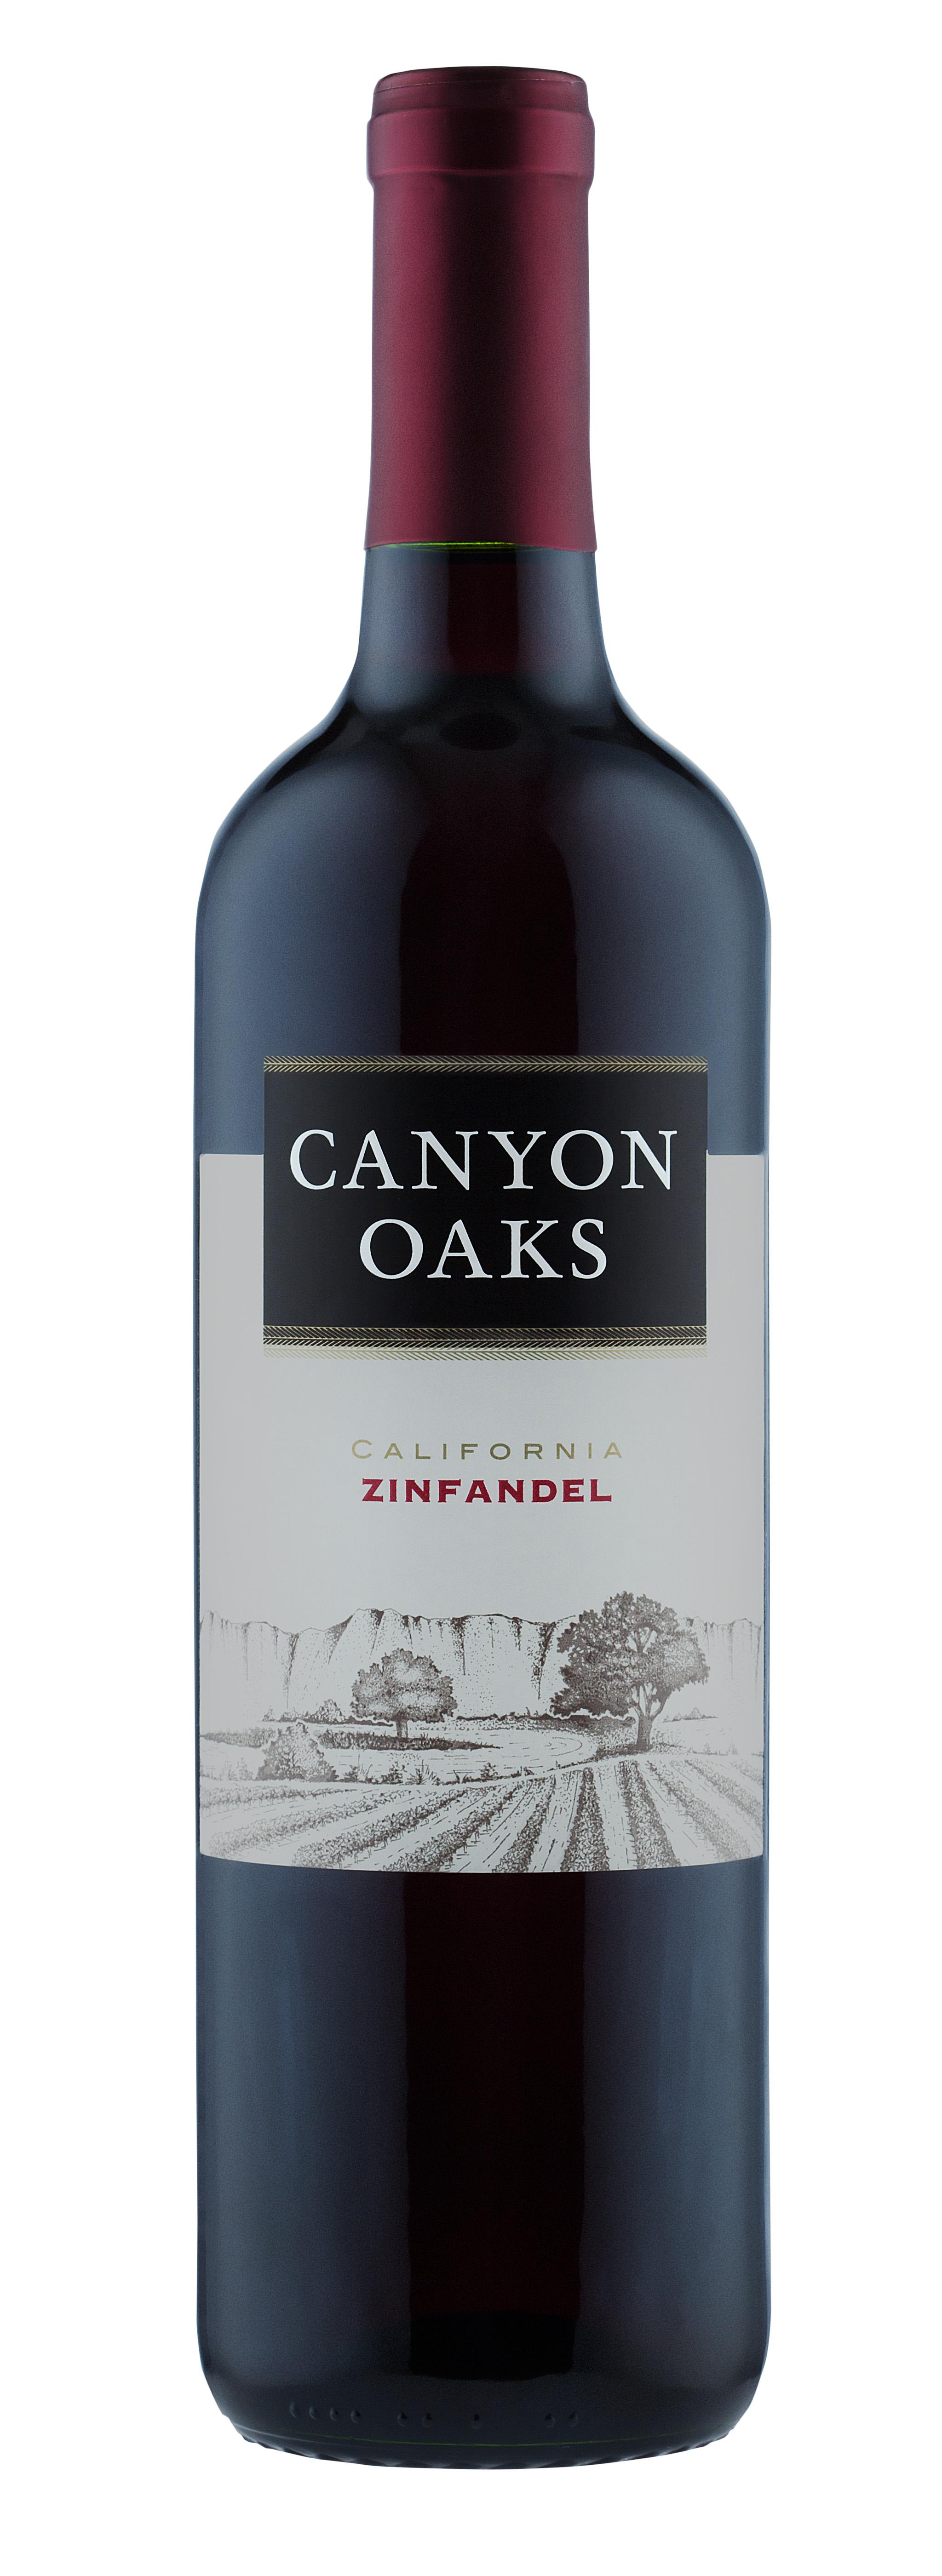 Canyon Oaks Zinfandel.jpg